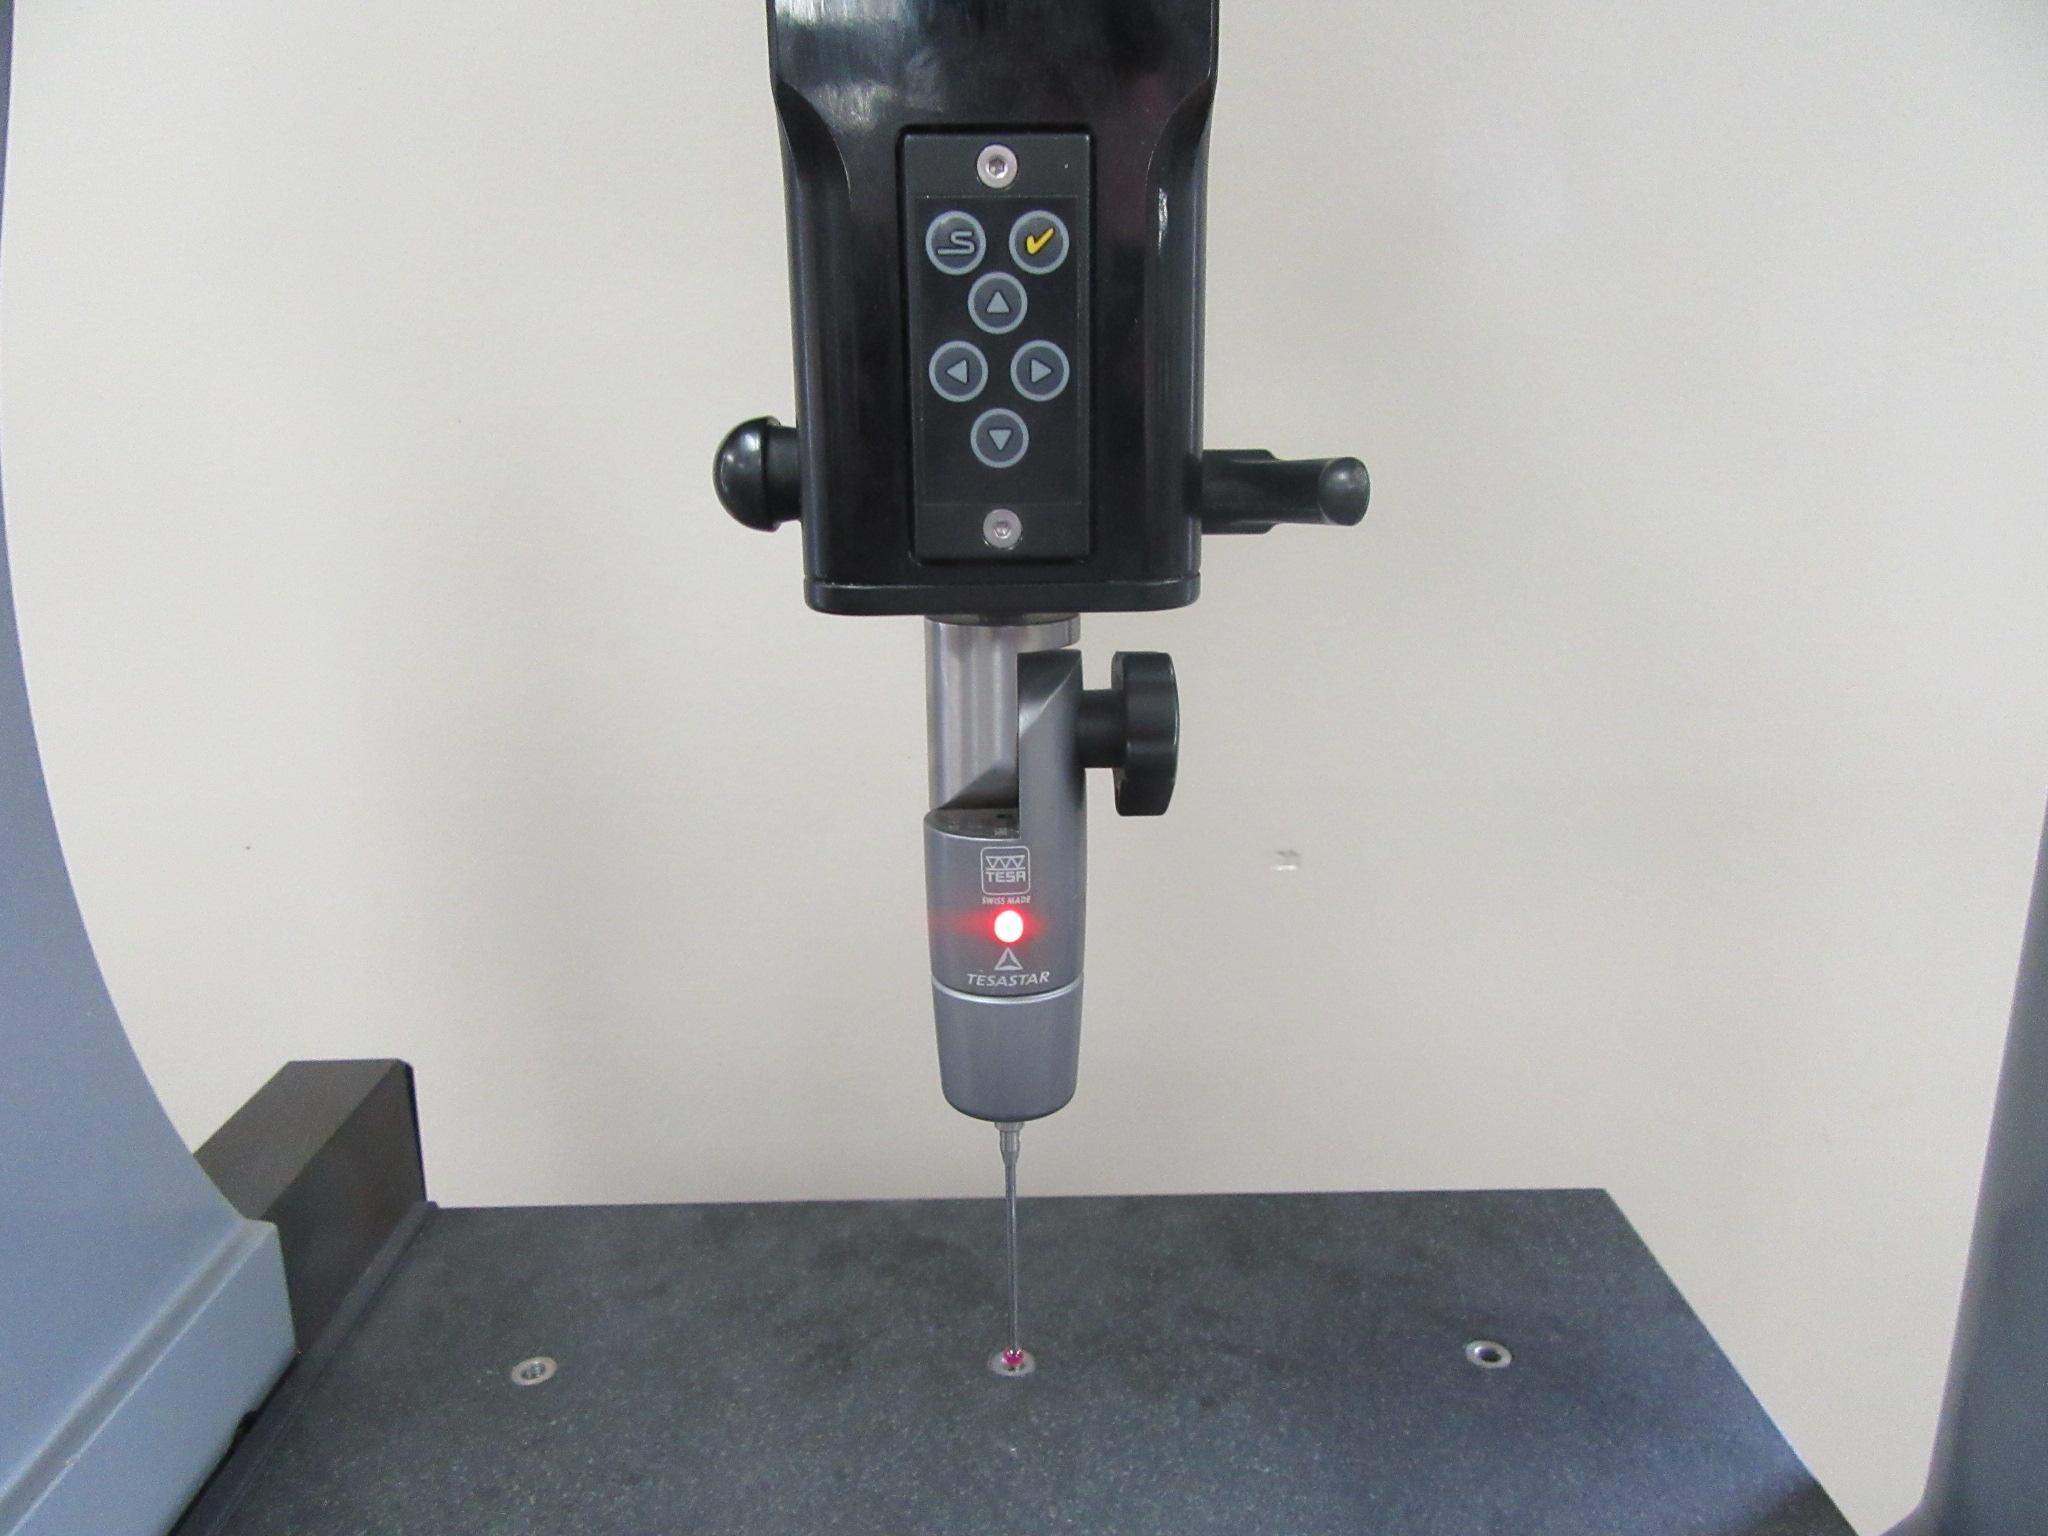 TESA Micro-Hite 3D  Model 454 Coordinate Measuring Machine with Tesastar Probe Head and TESA Reflex Controls